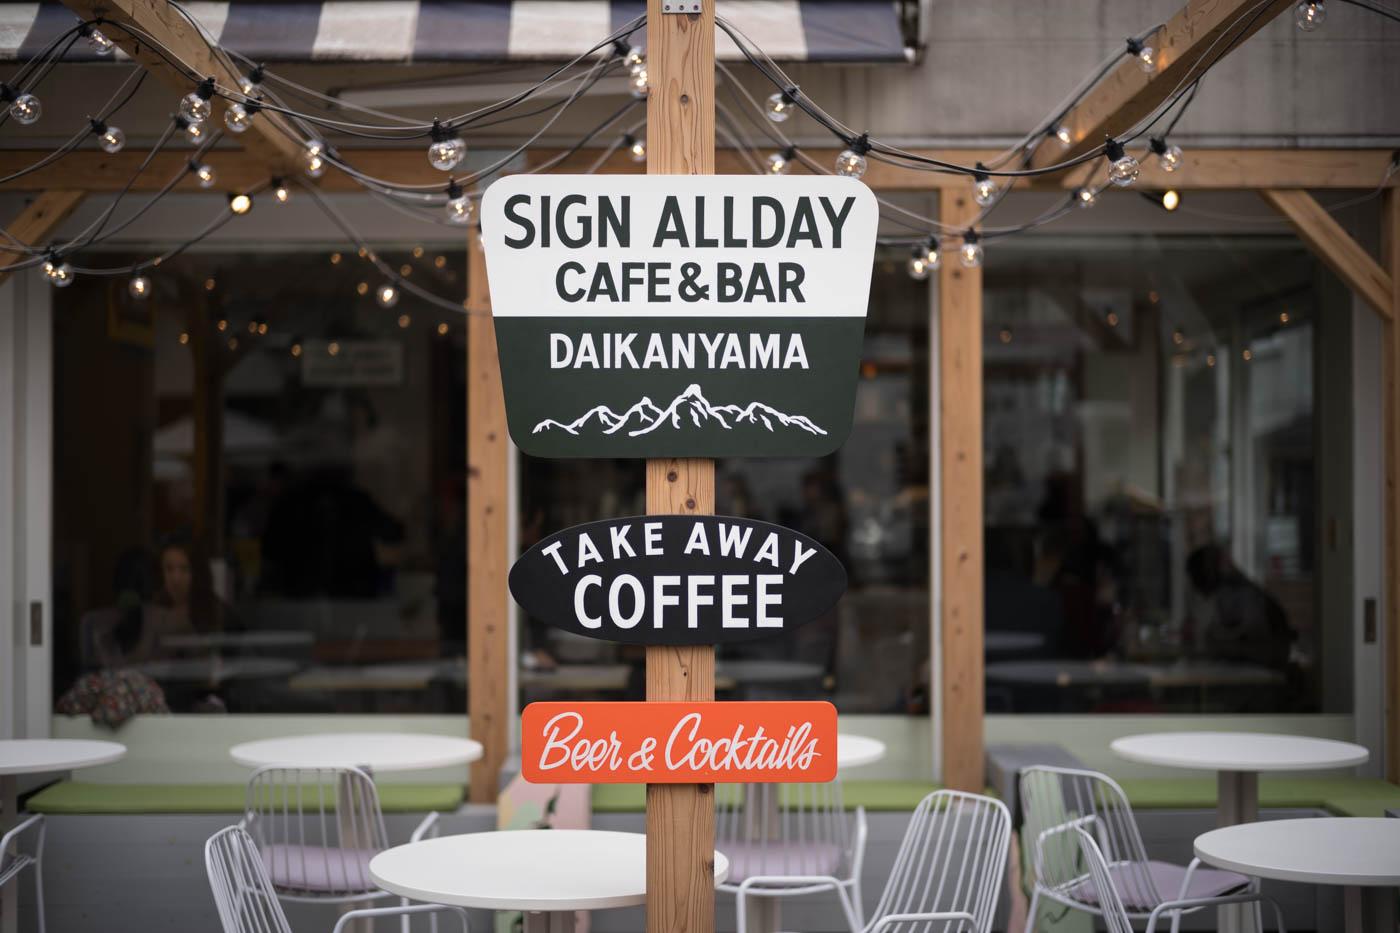 Daikanyama Take Away Coffee